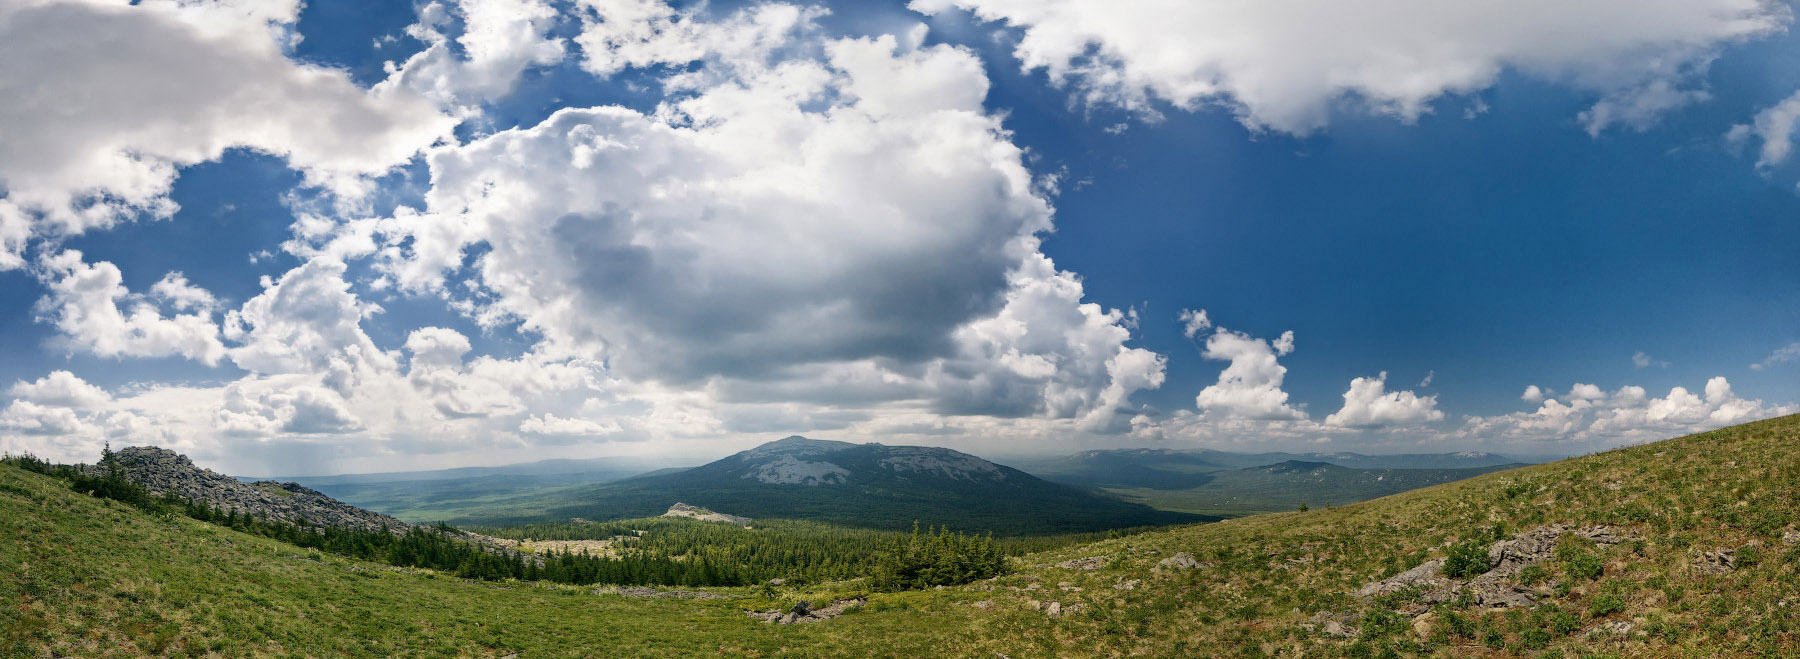 Нургуш панорама медитация фотограф Челябинск